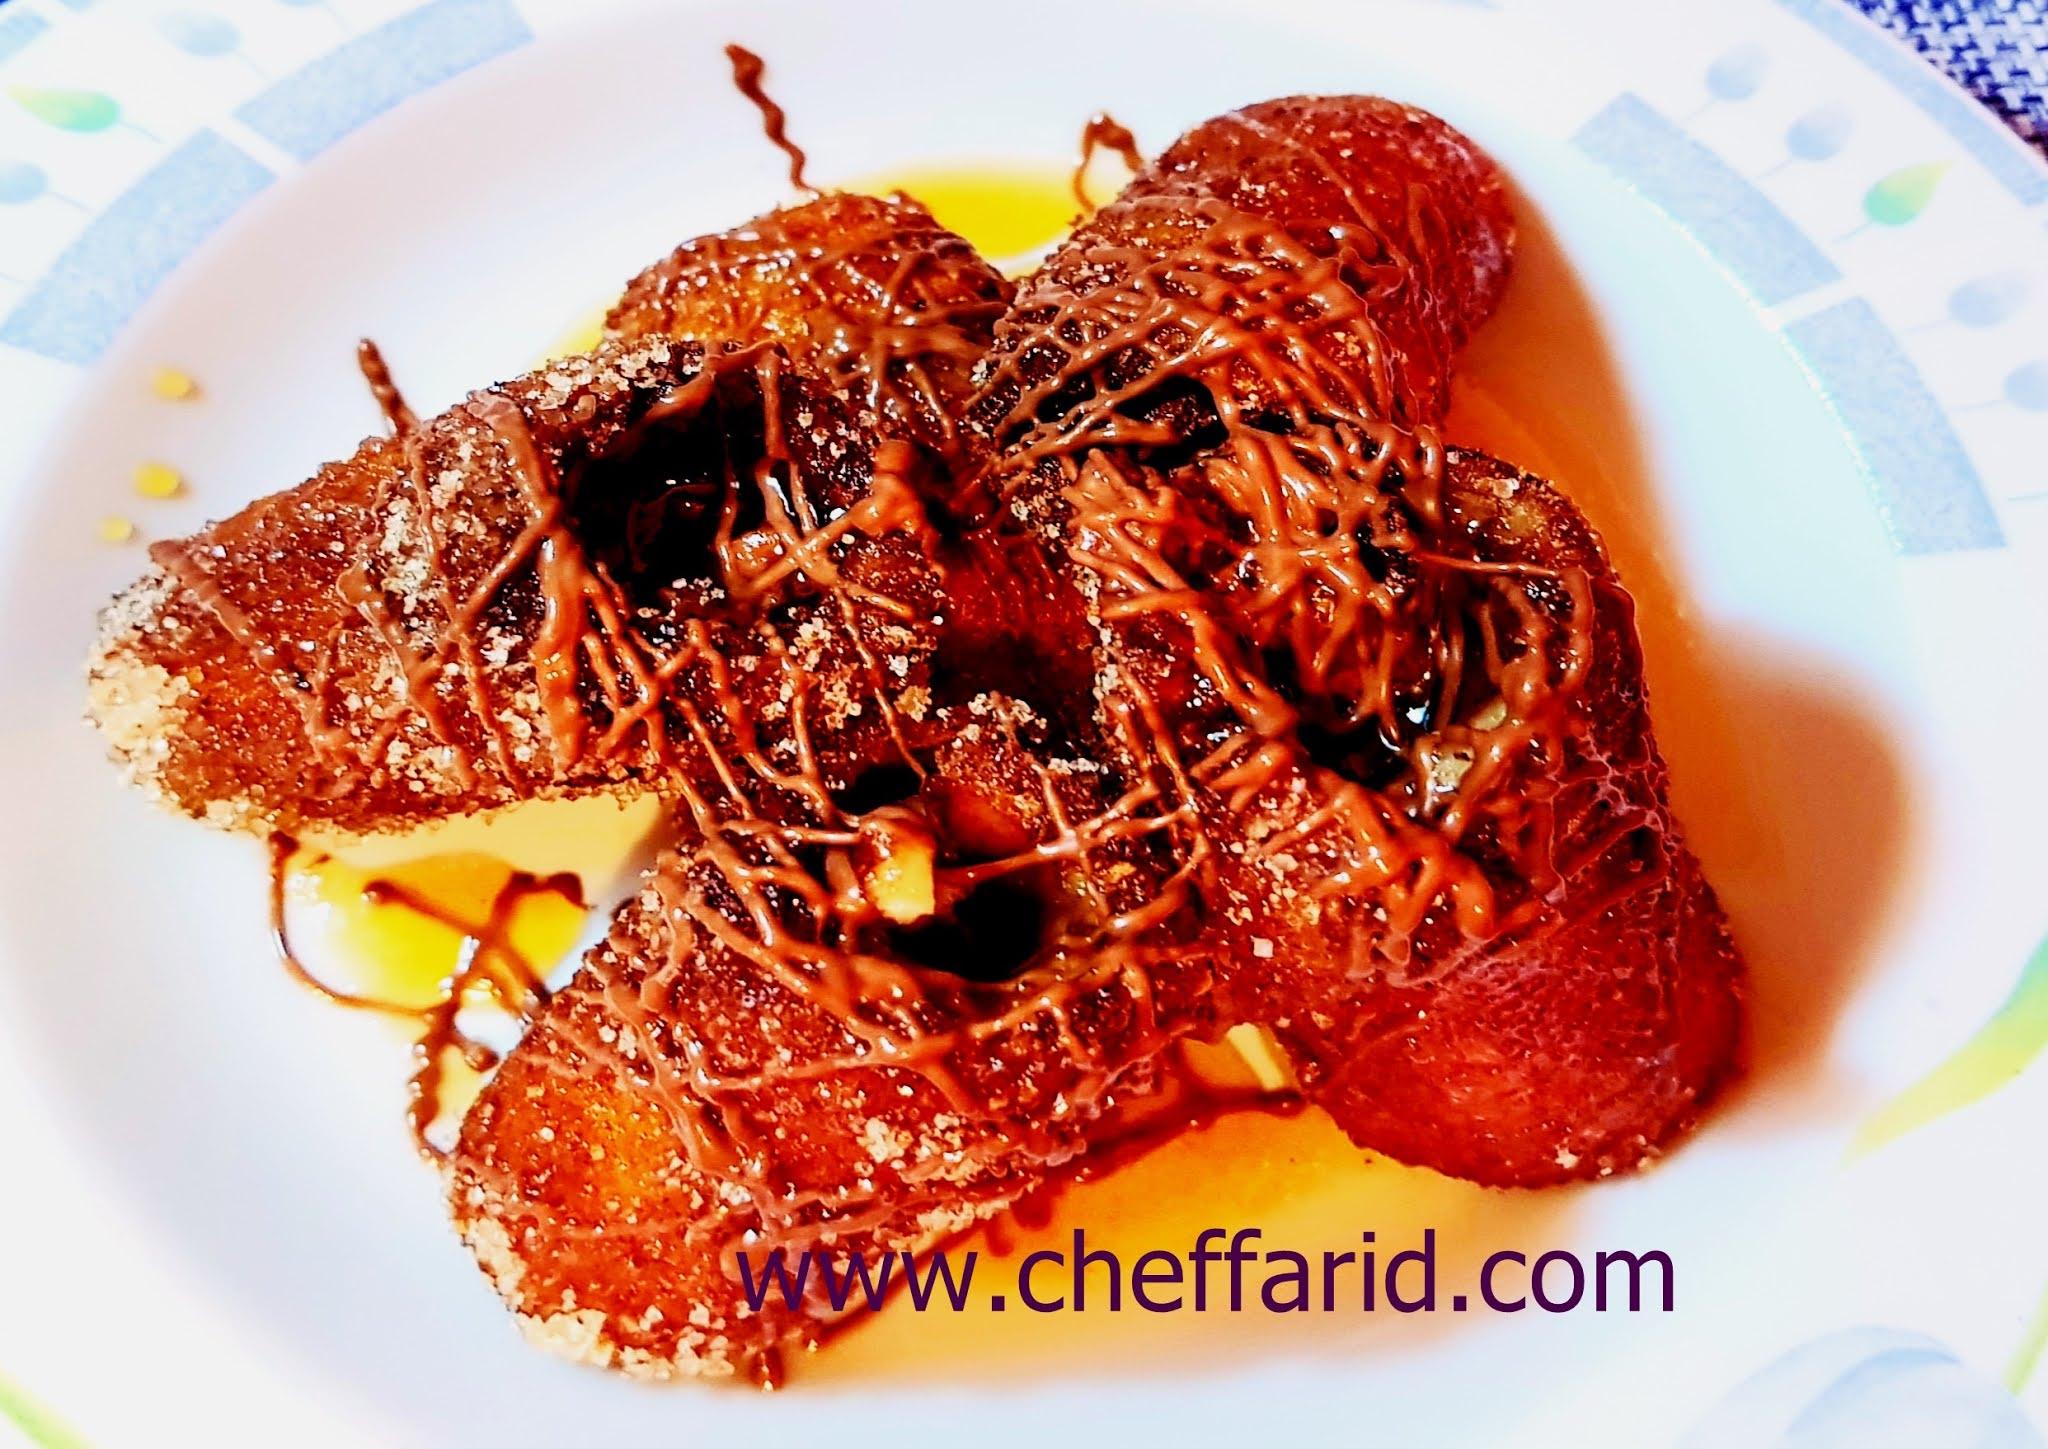 fried banana with chocolat and honey